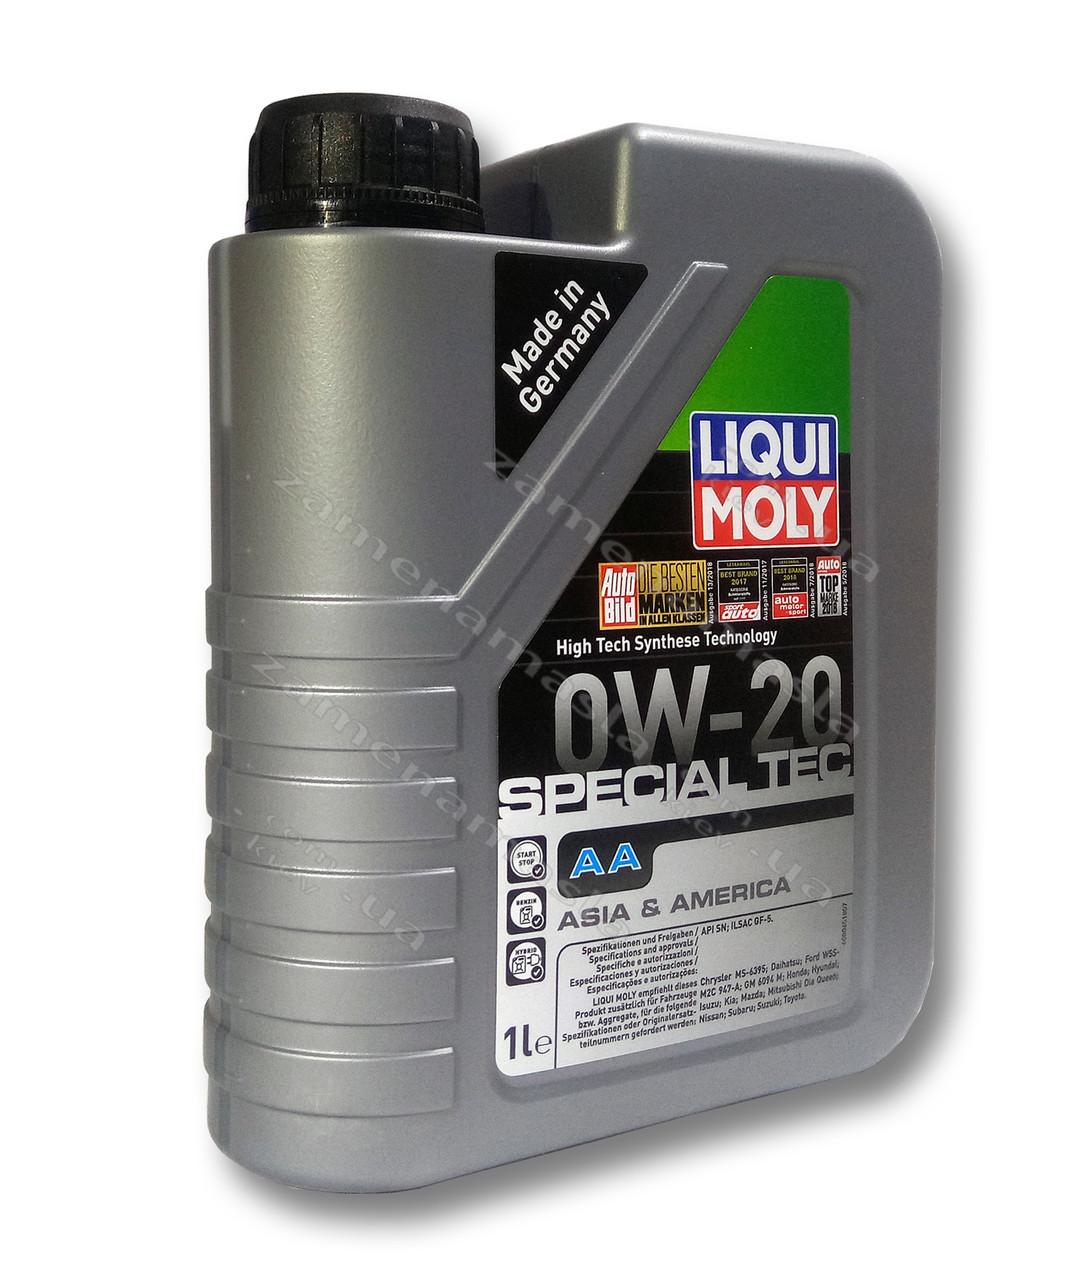 LIQUI MOLY SPECIAL TEC AA 0W-20 1л - моторное масло